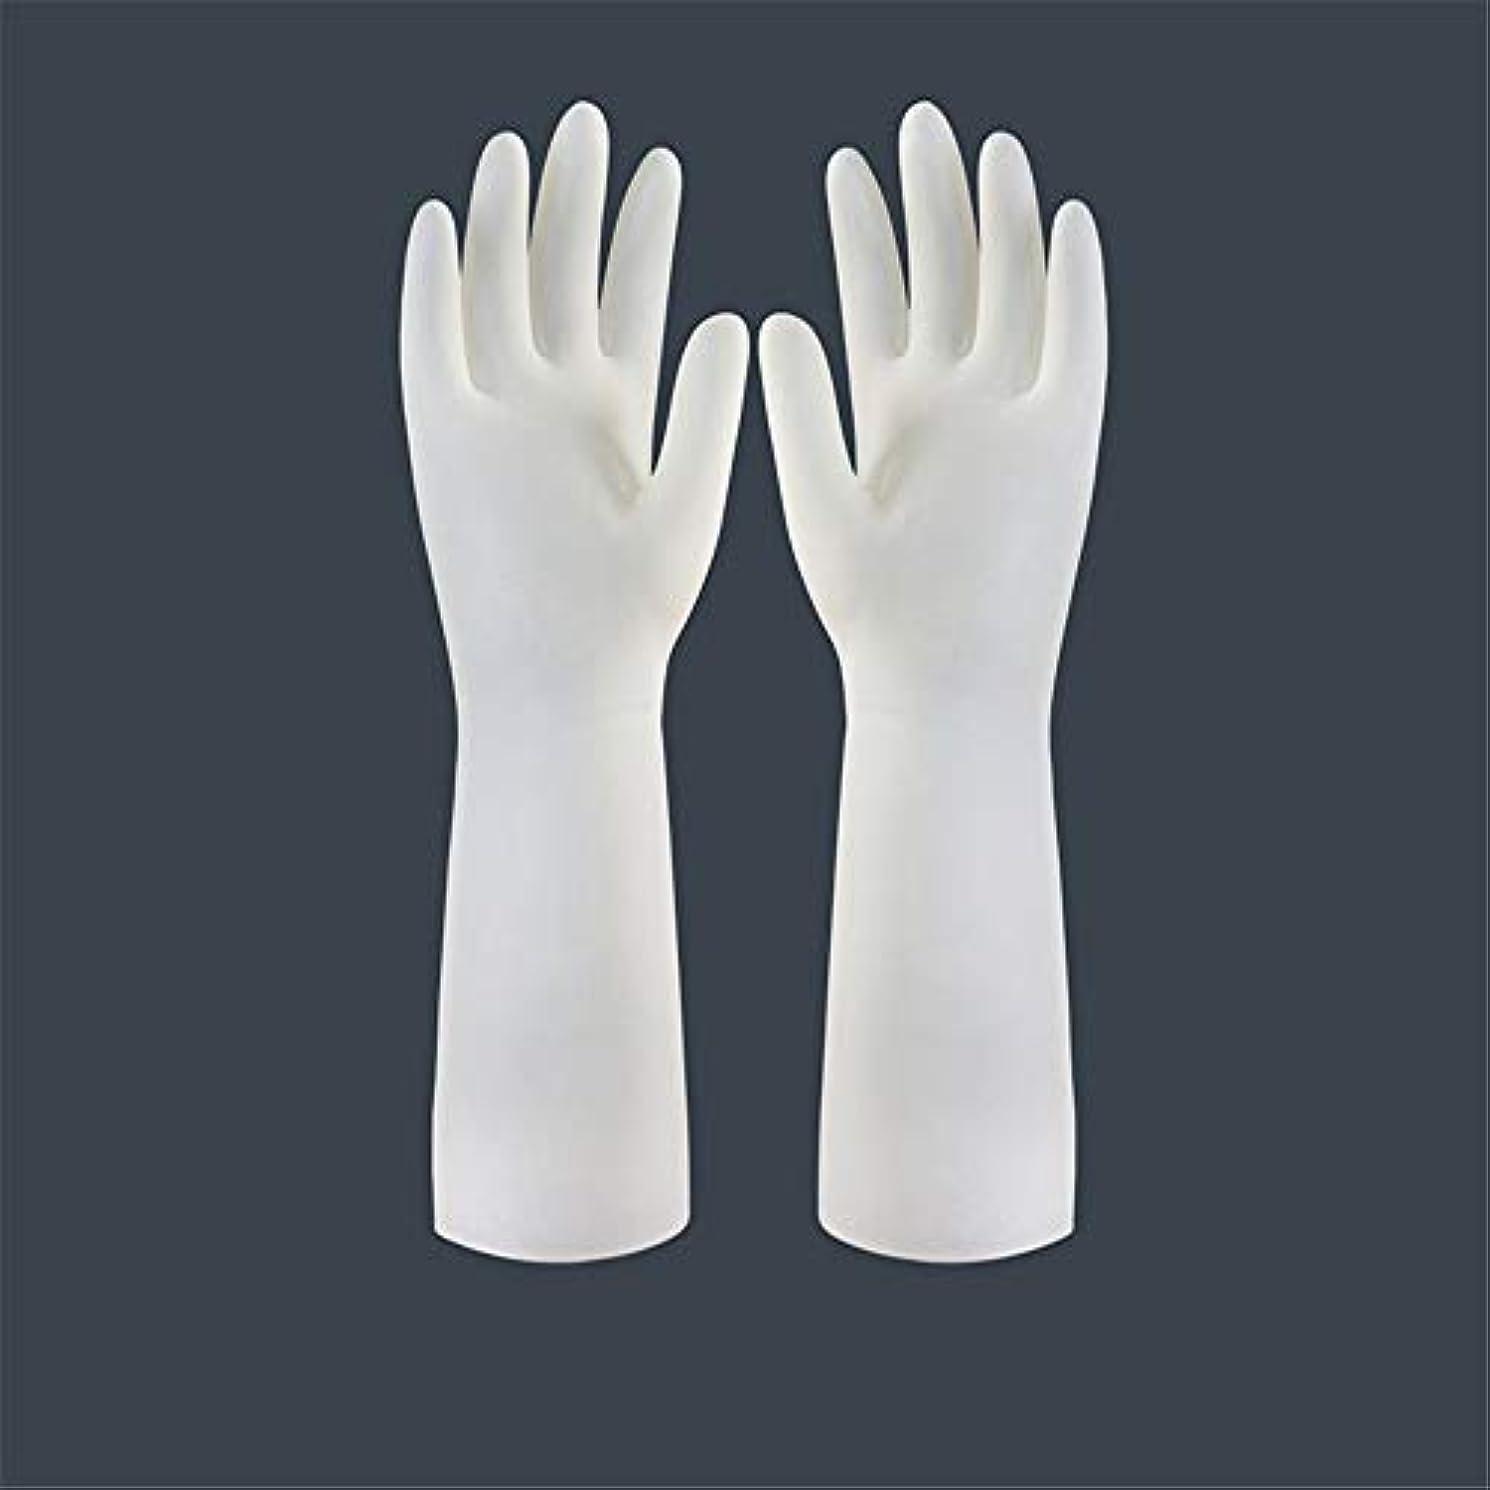 分析的褐色外観BTXXYJP キッチン用手袋 手袋 食器洗い 作業 炊事 食器洗い 掃除 園芸 洗車 防水 防油 手袋 (Color : Long-1 pair, Size : L)